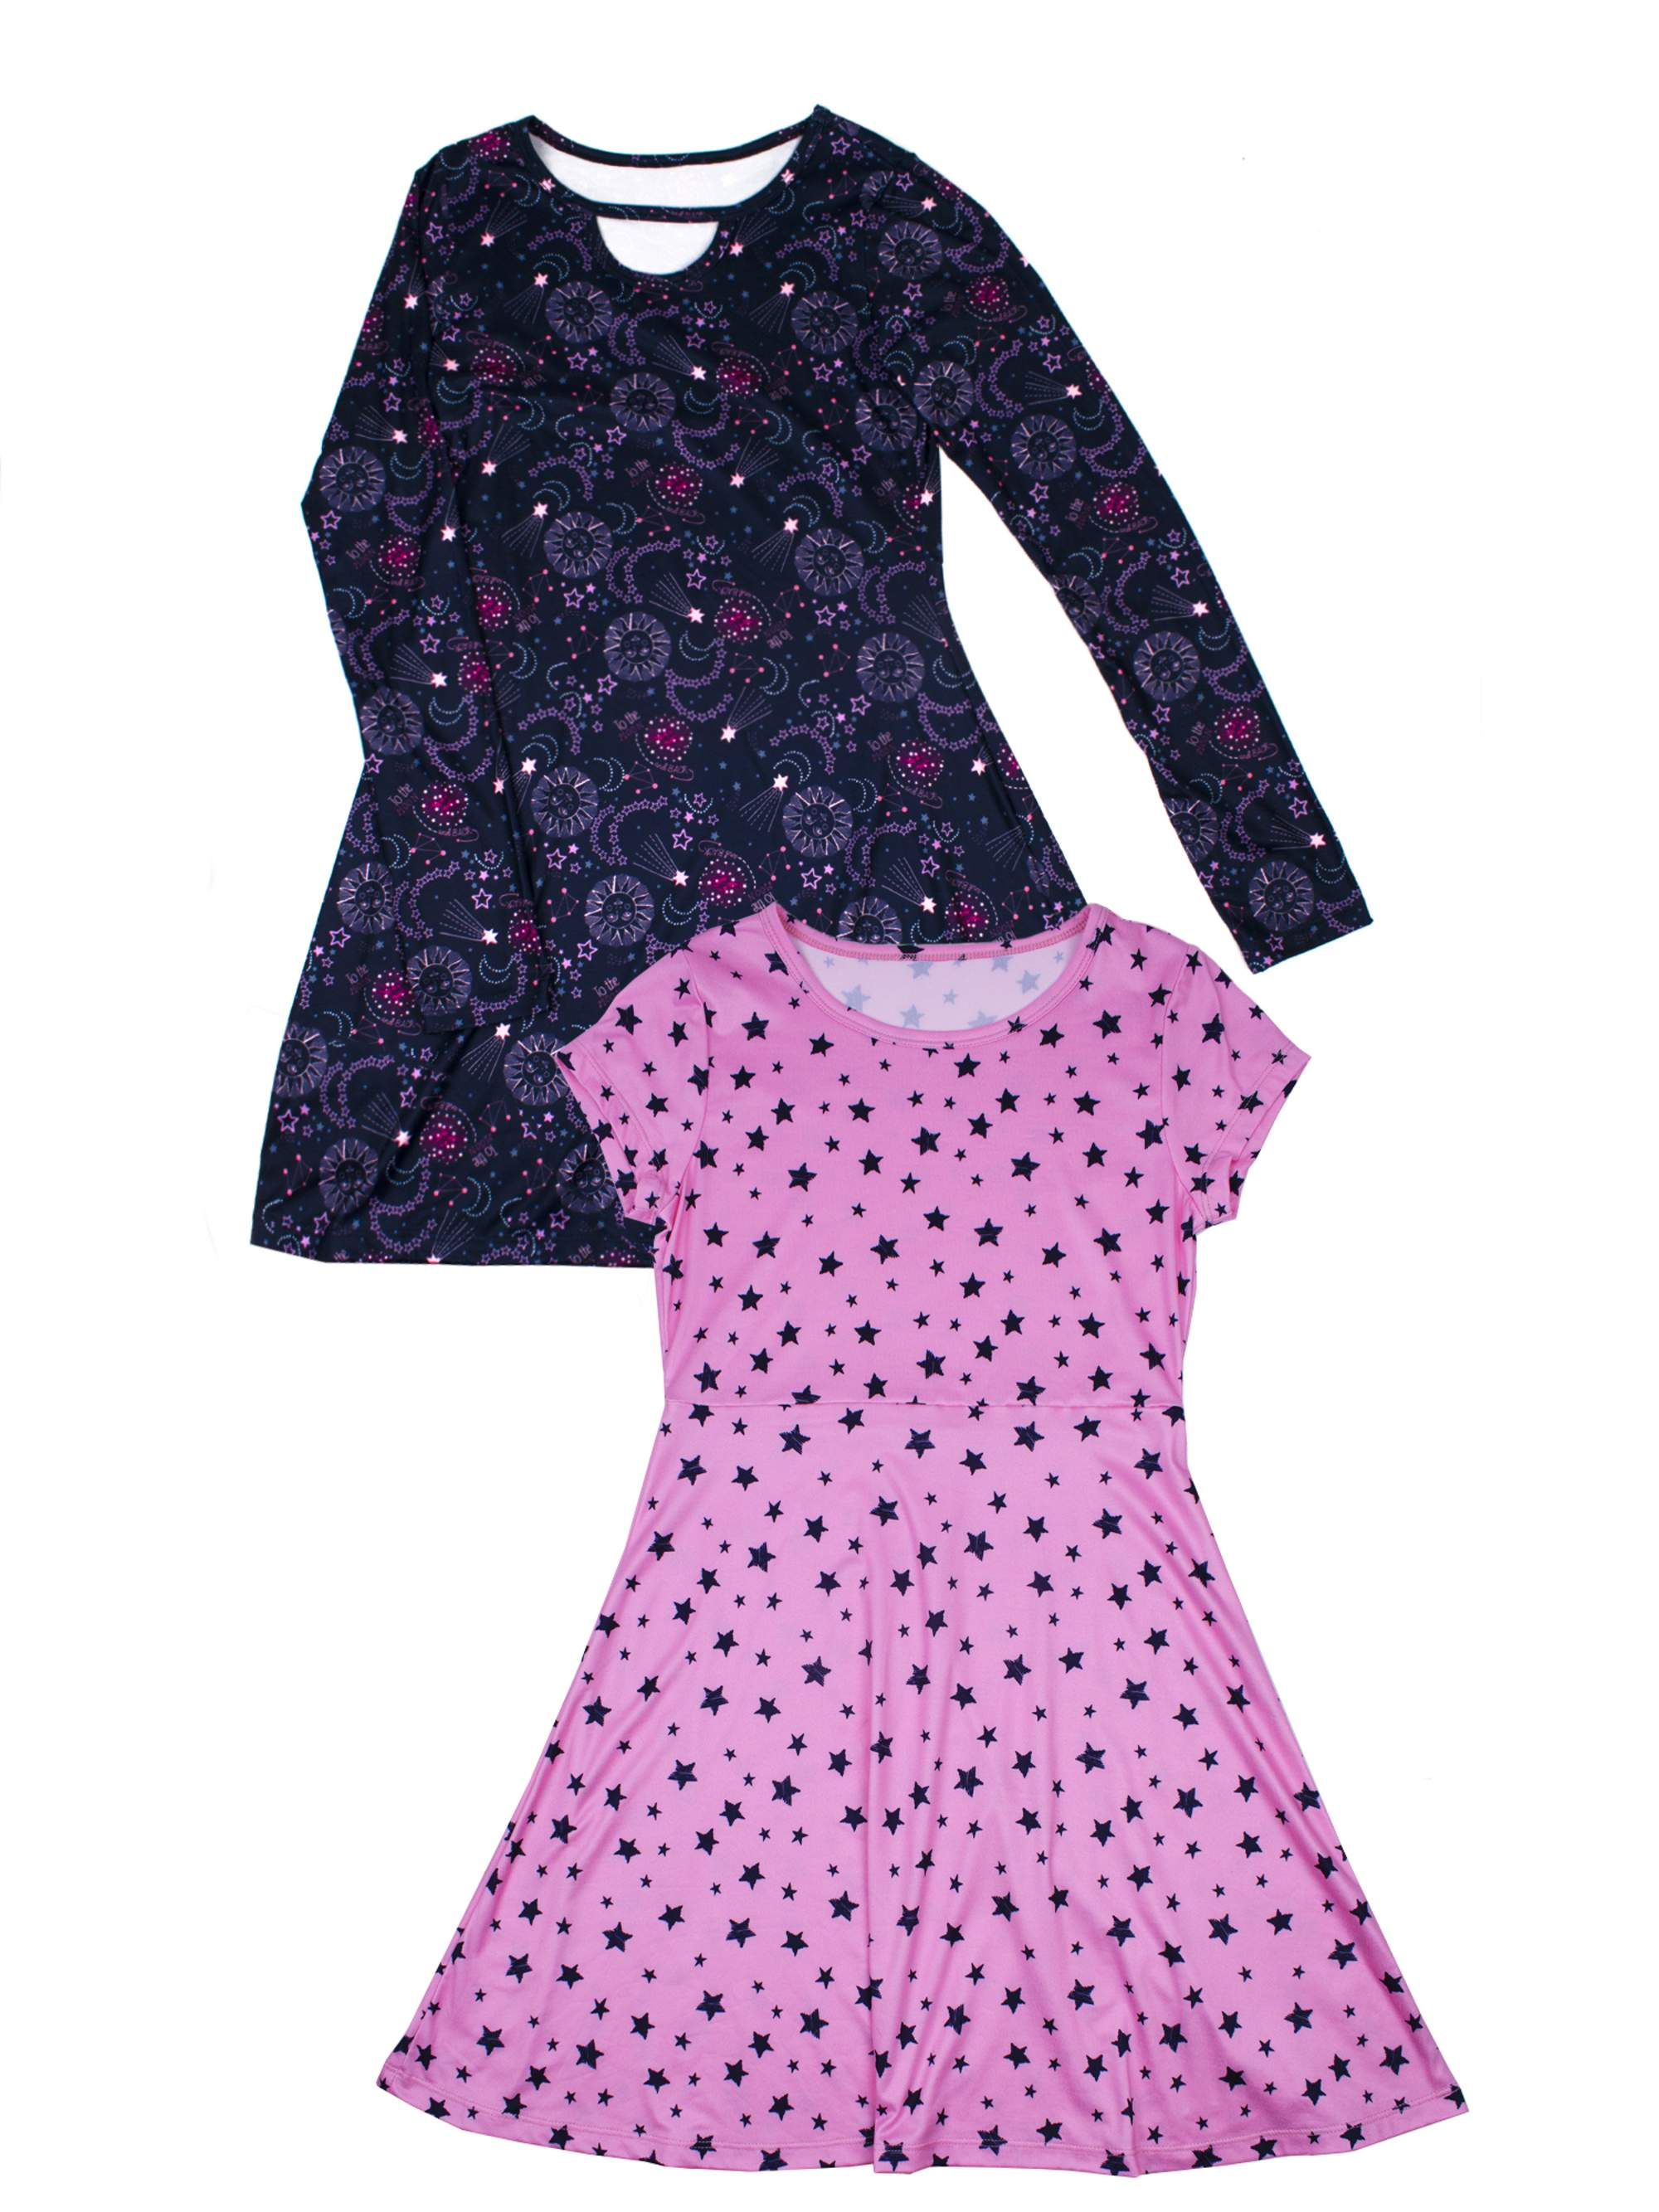 Bell Sleeve And Short Sleeve Unicorn Dresses, 2-Pack (Little Girls & Big Girls)